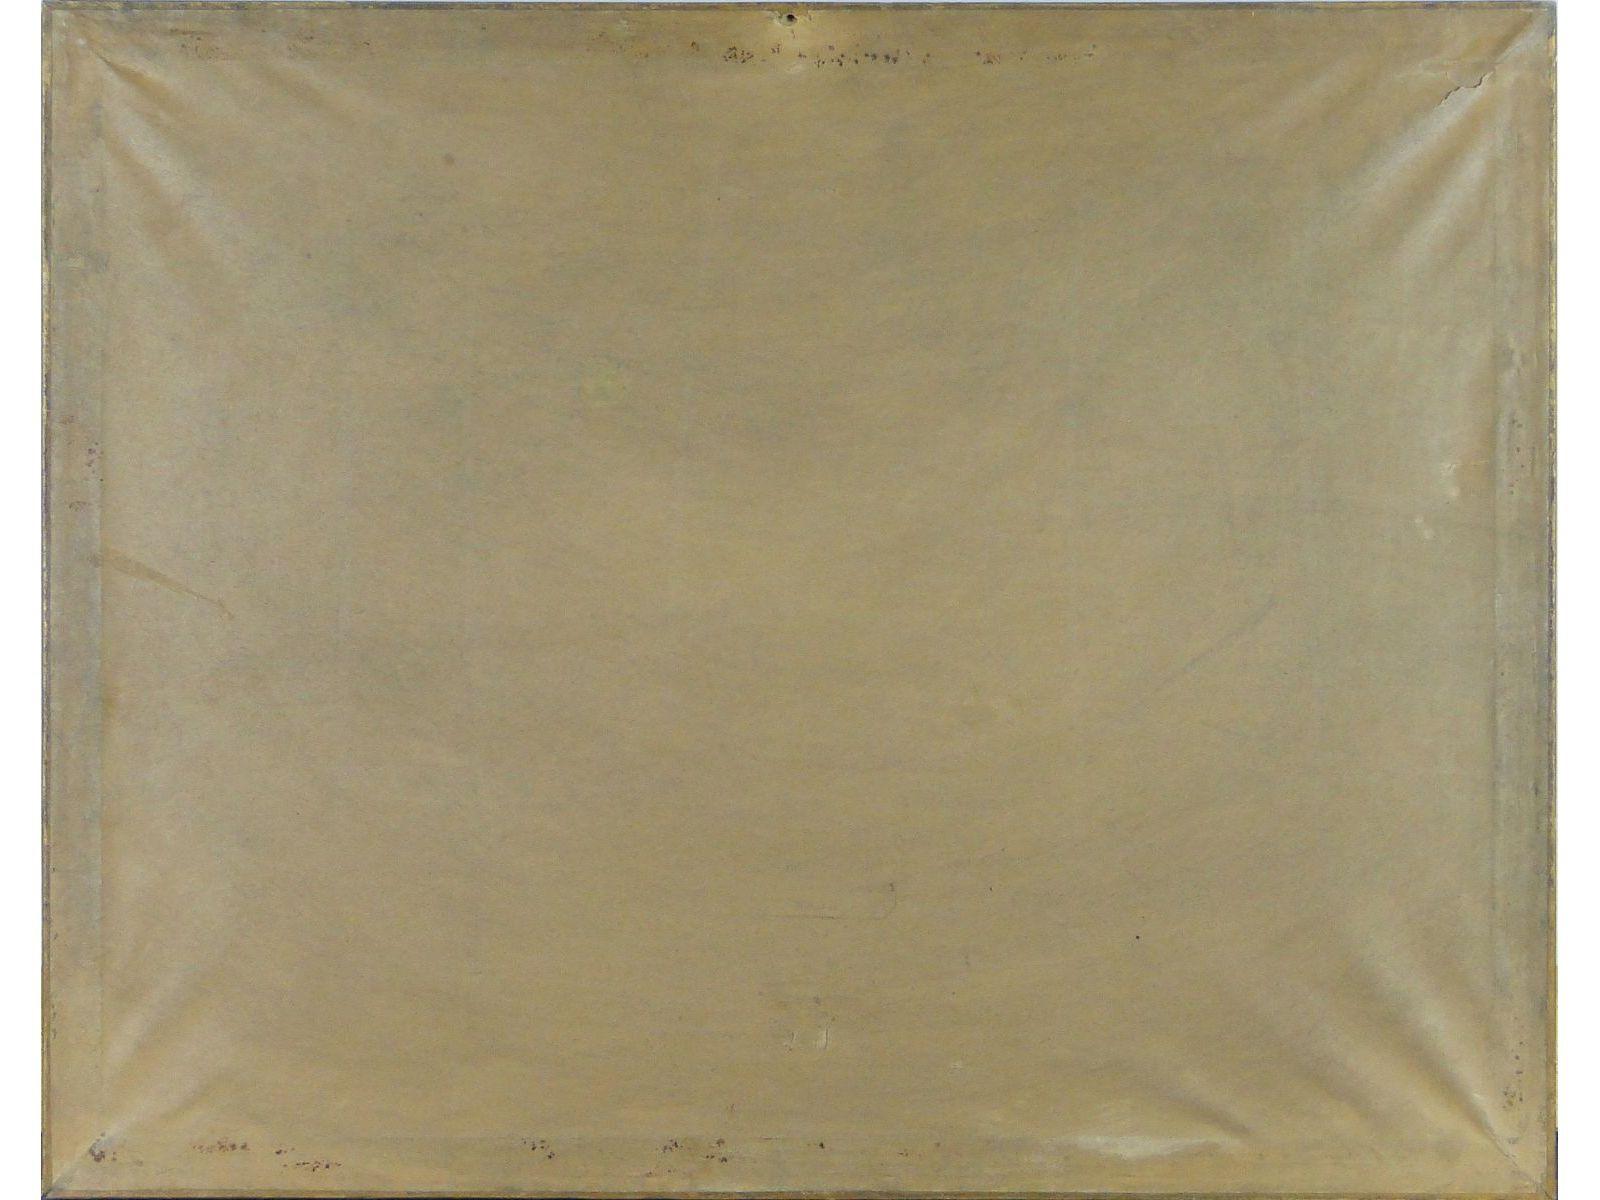 DSC04899.JPG (1600�1200)